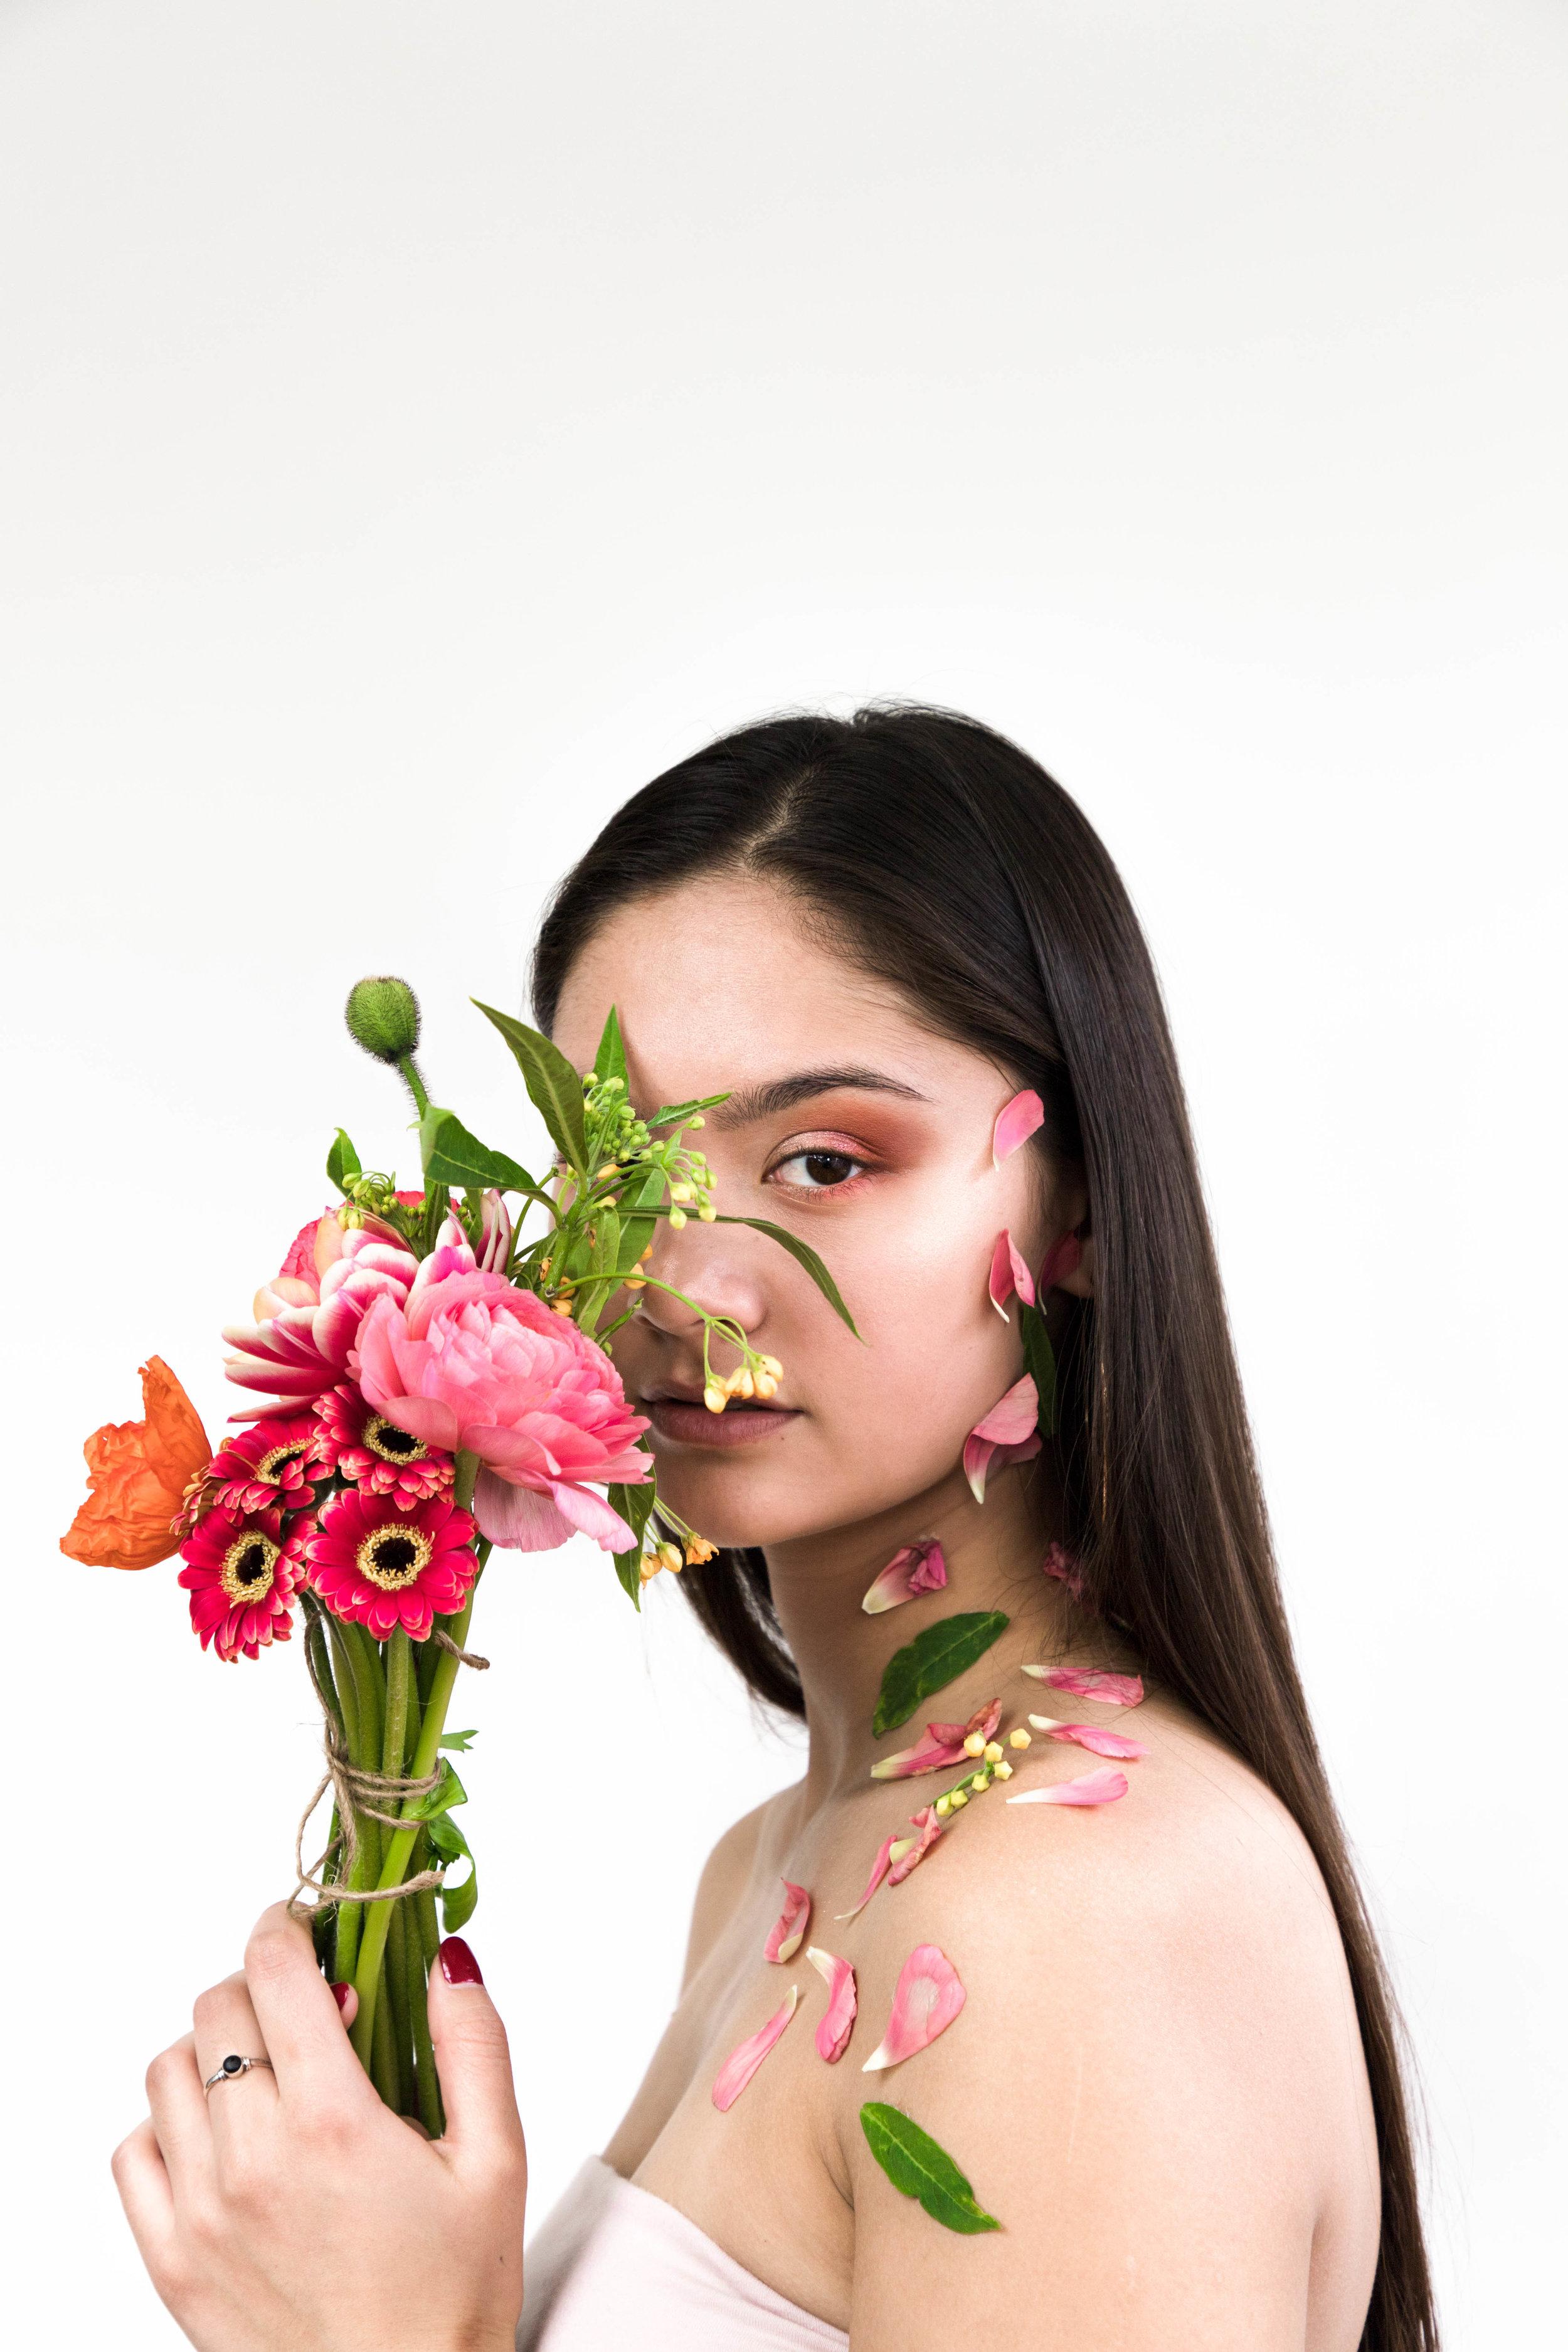 20171219_Flowers_Chanel_Emma_Sho_0004.jpg